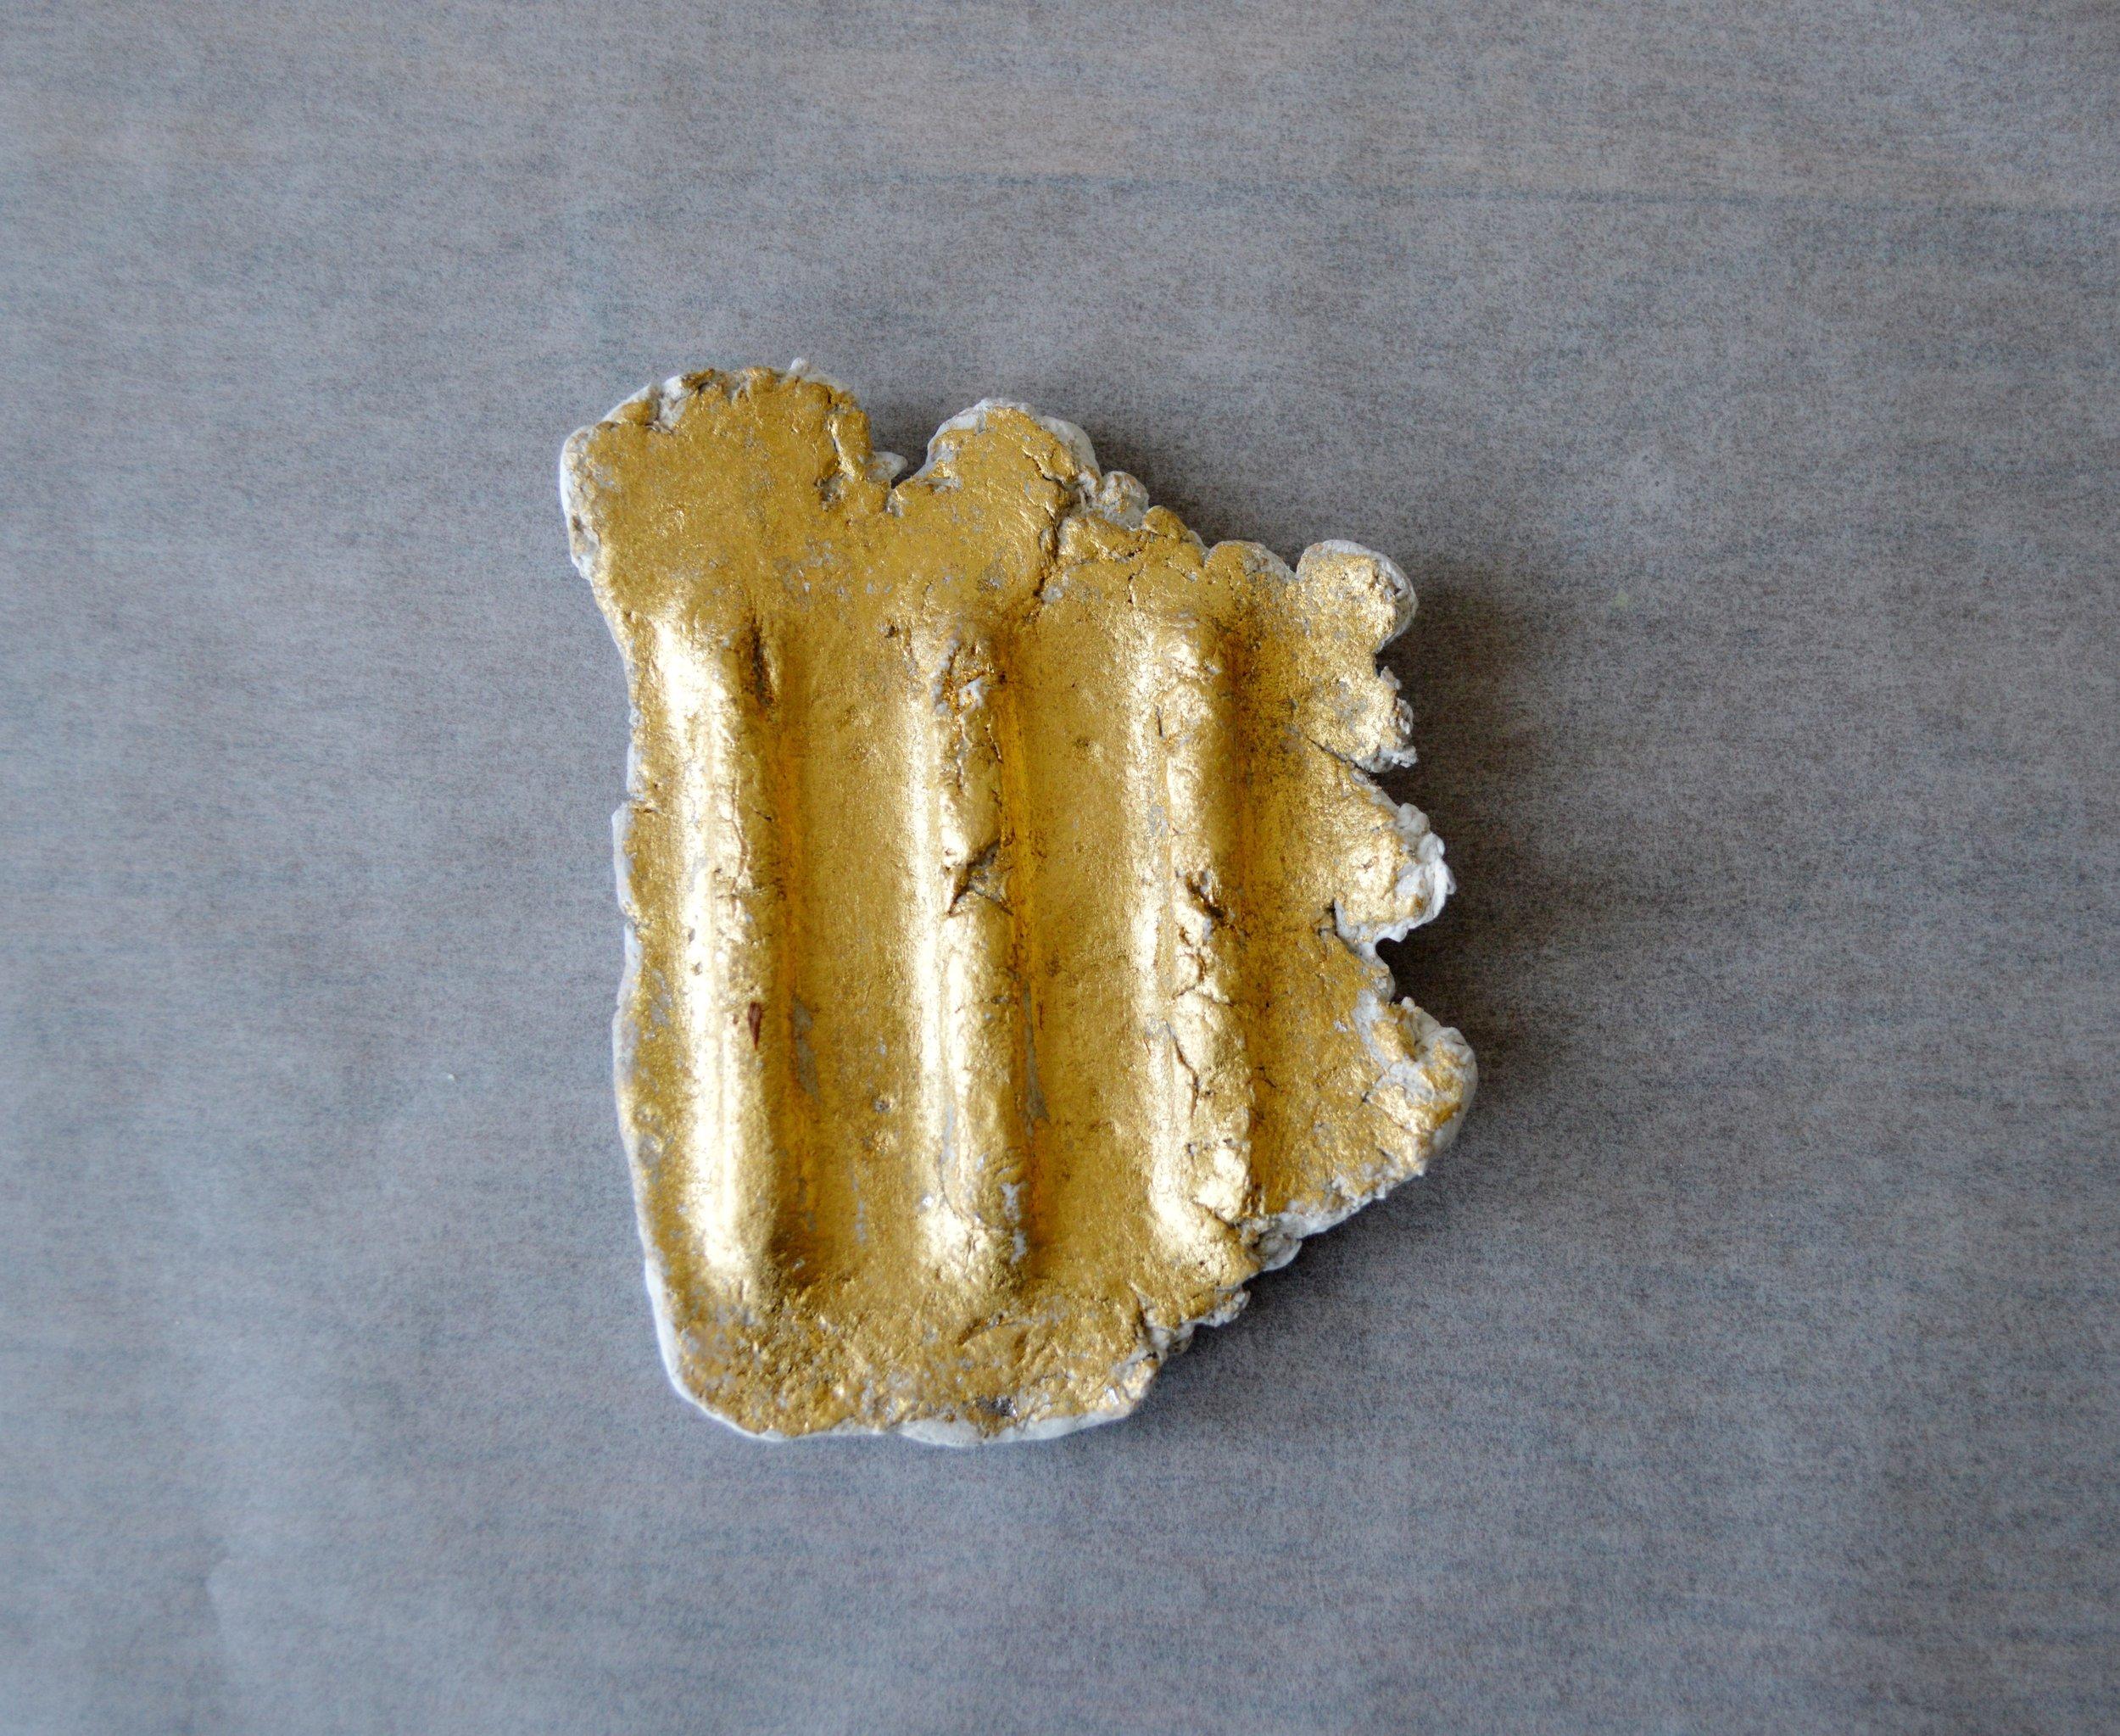 "3'  , site: anterior gallery. material: air dry clay, 24k gold leaf, graphite, gesso, matte medium. 5"" x 4"" x 0.5"", June 2019"